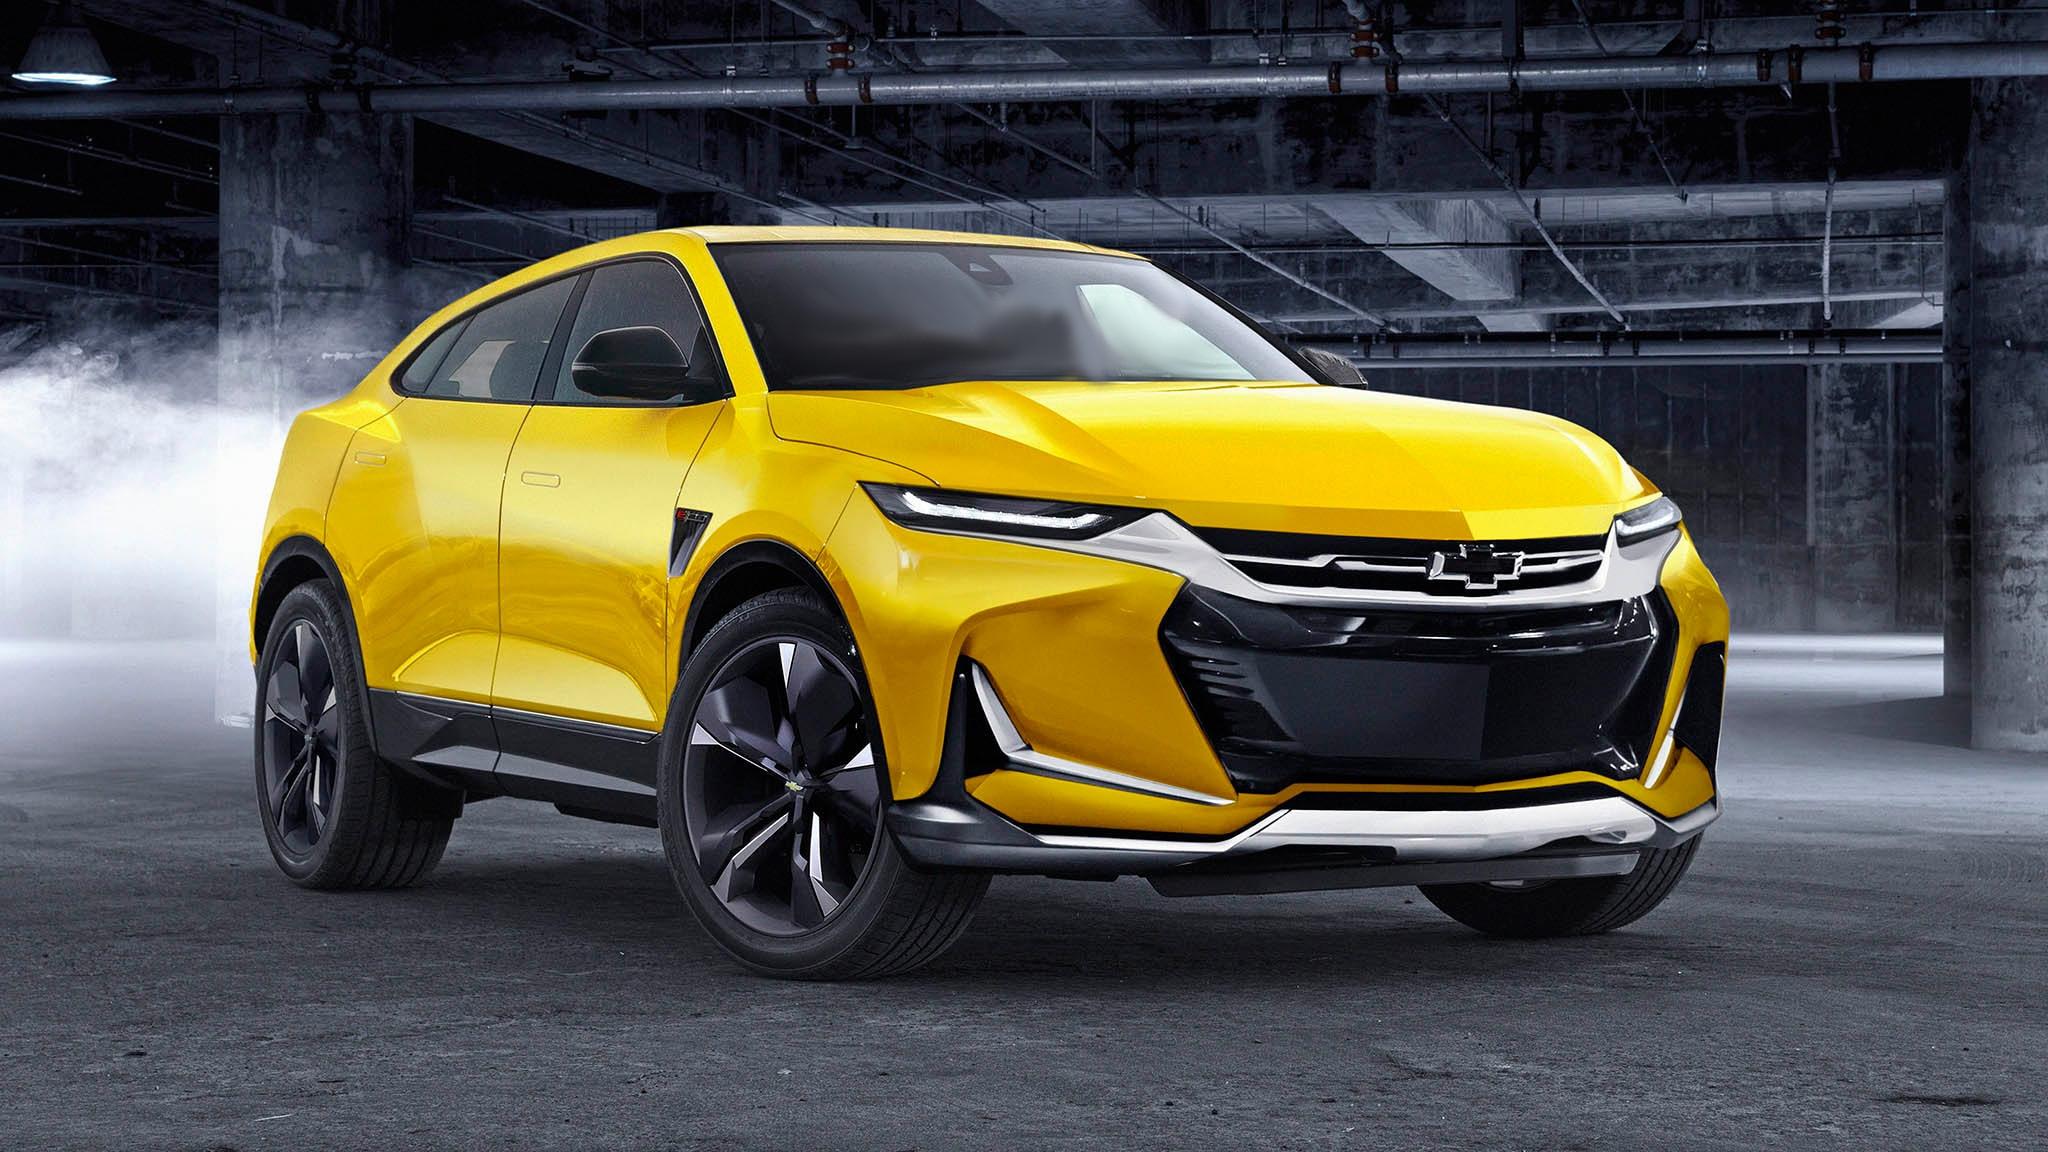 2021-Chevrolet-Camaro-E28-electric-SUV-front-three-quarter-render